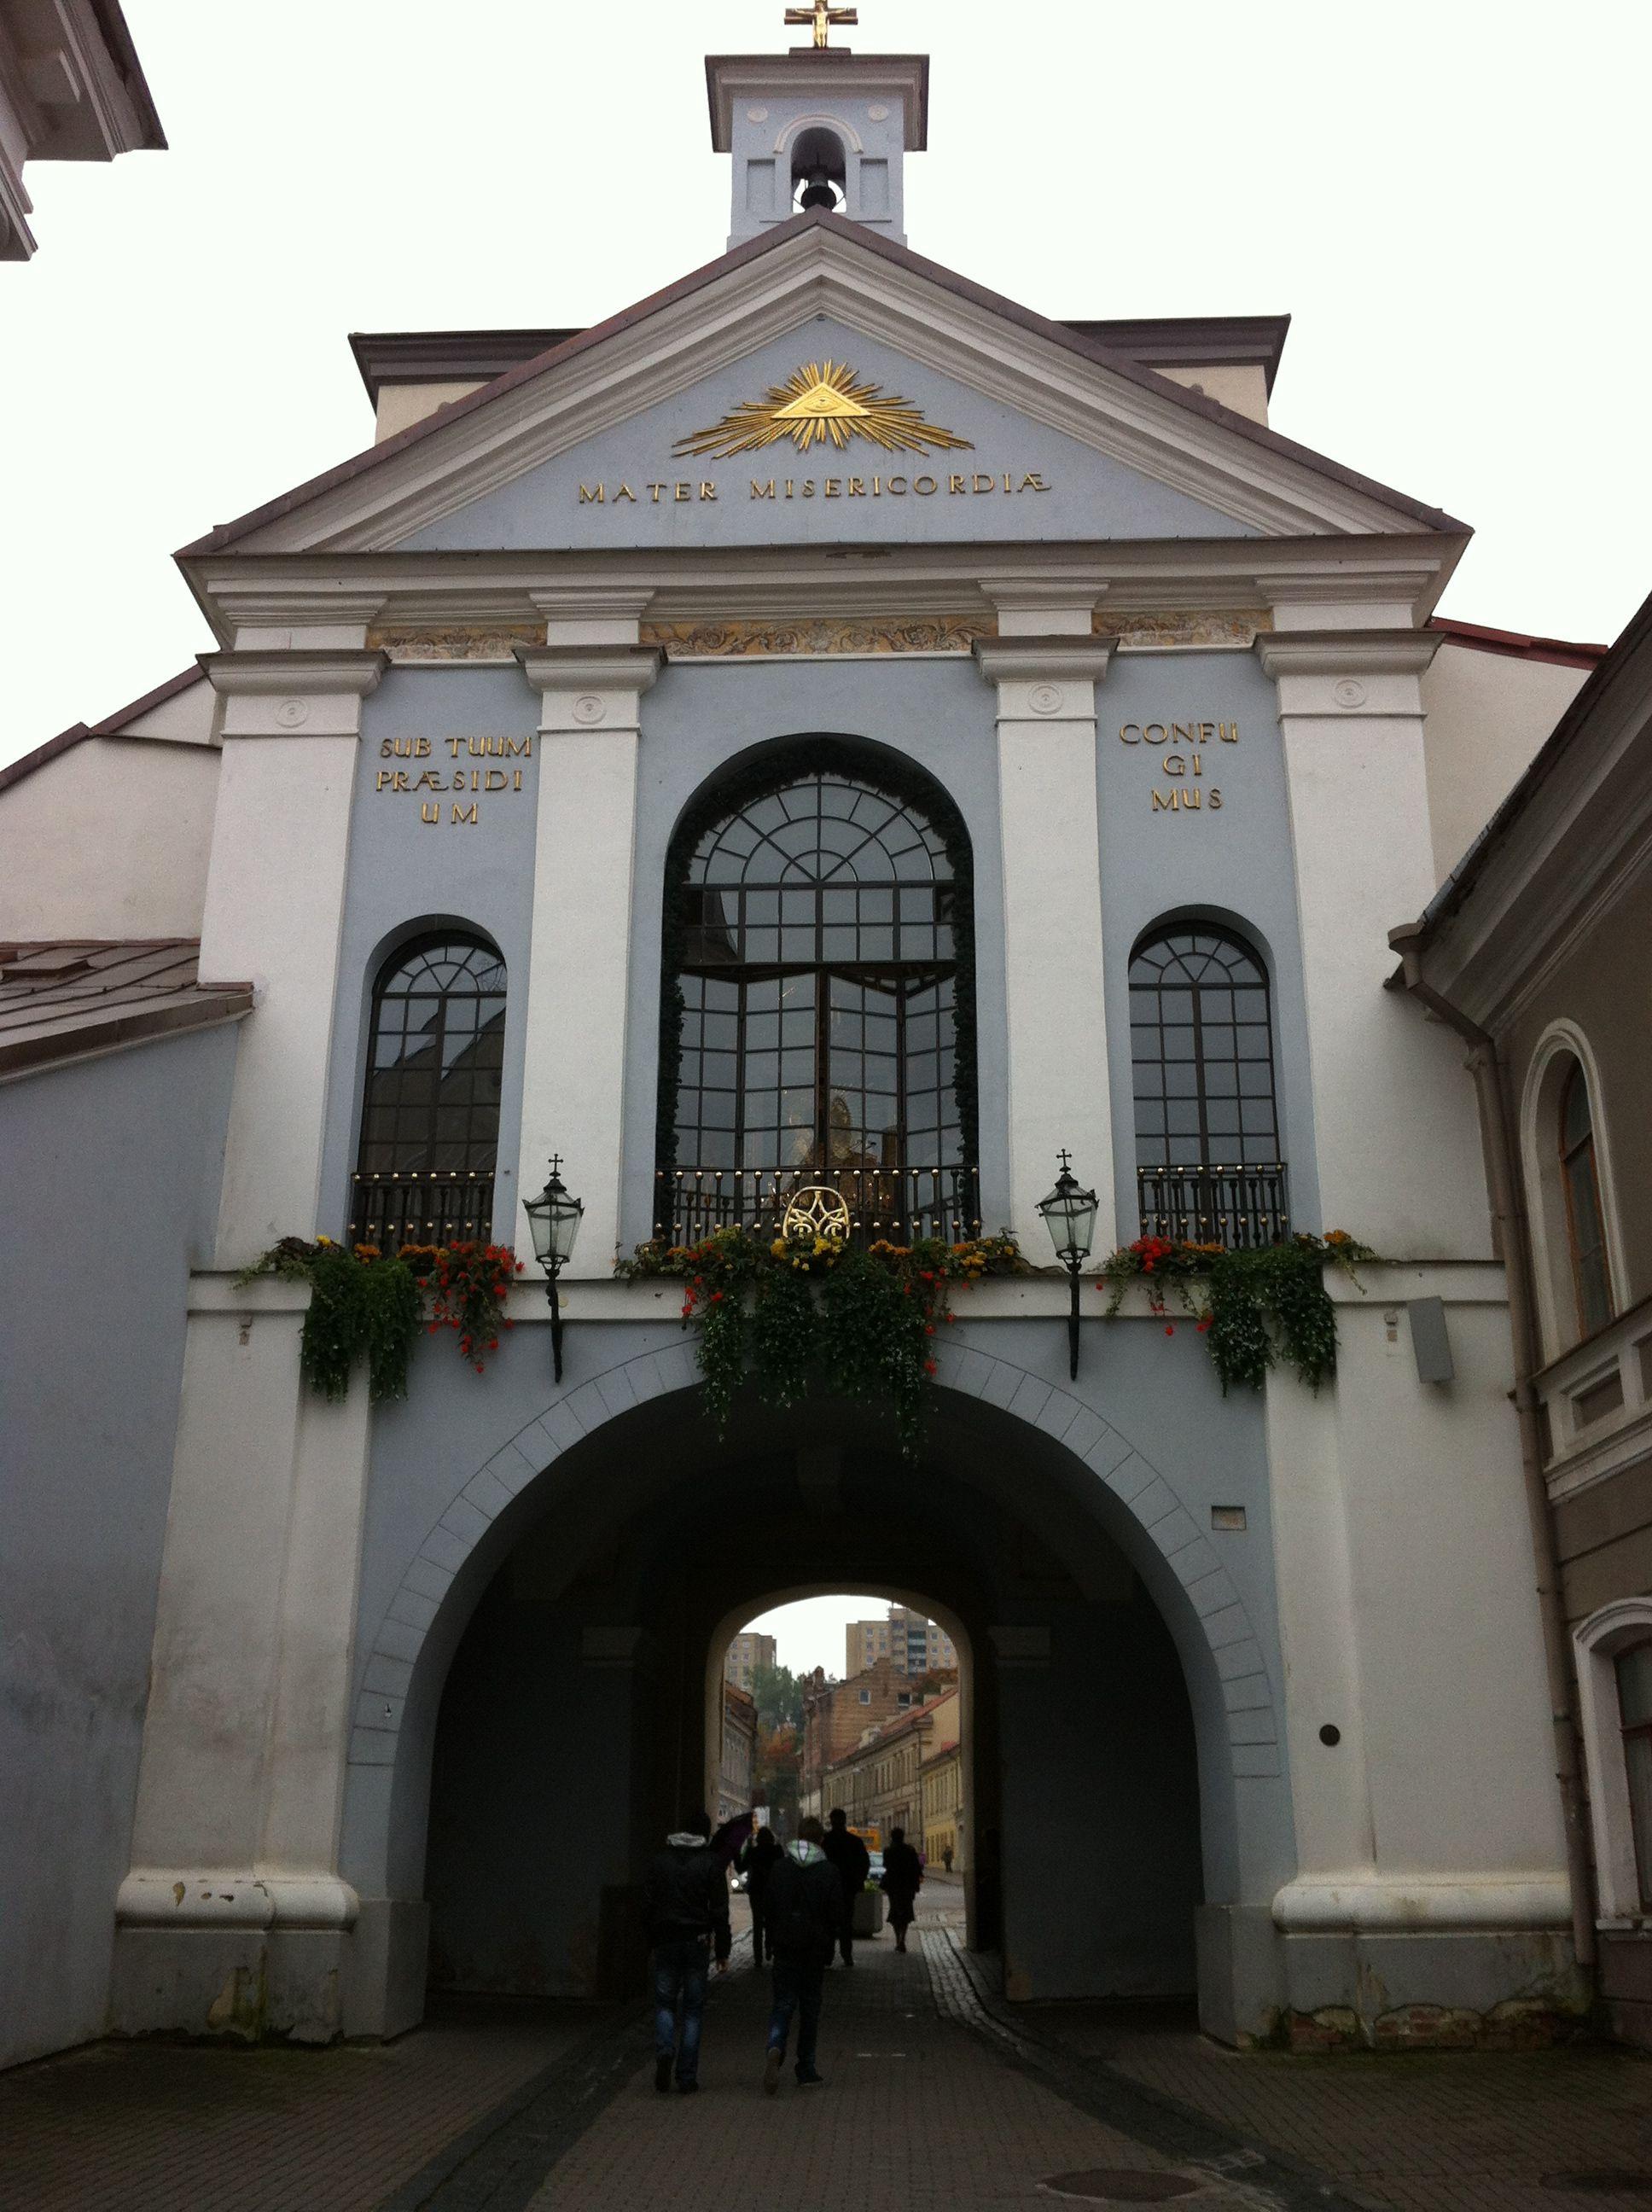 The Gate of Dawn in Lithuanian capital city Vilnius, It was built between 1503 and 1522 - Aušros Vartai, Vilnius, Lietuva - Ostra Brama, Wilno, Litwa - Острая Брама, Вильнюс, Литва.